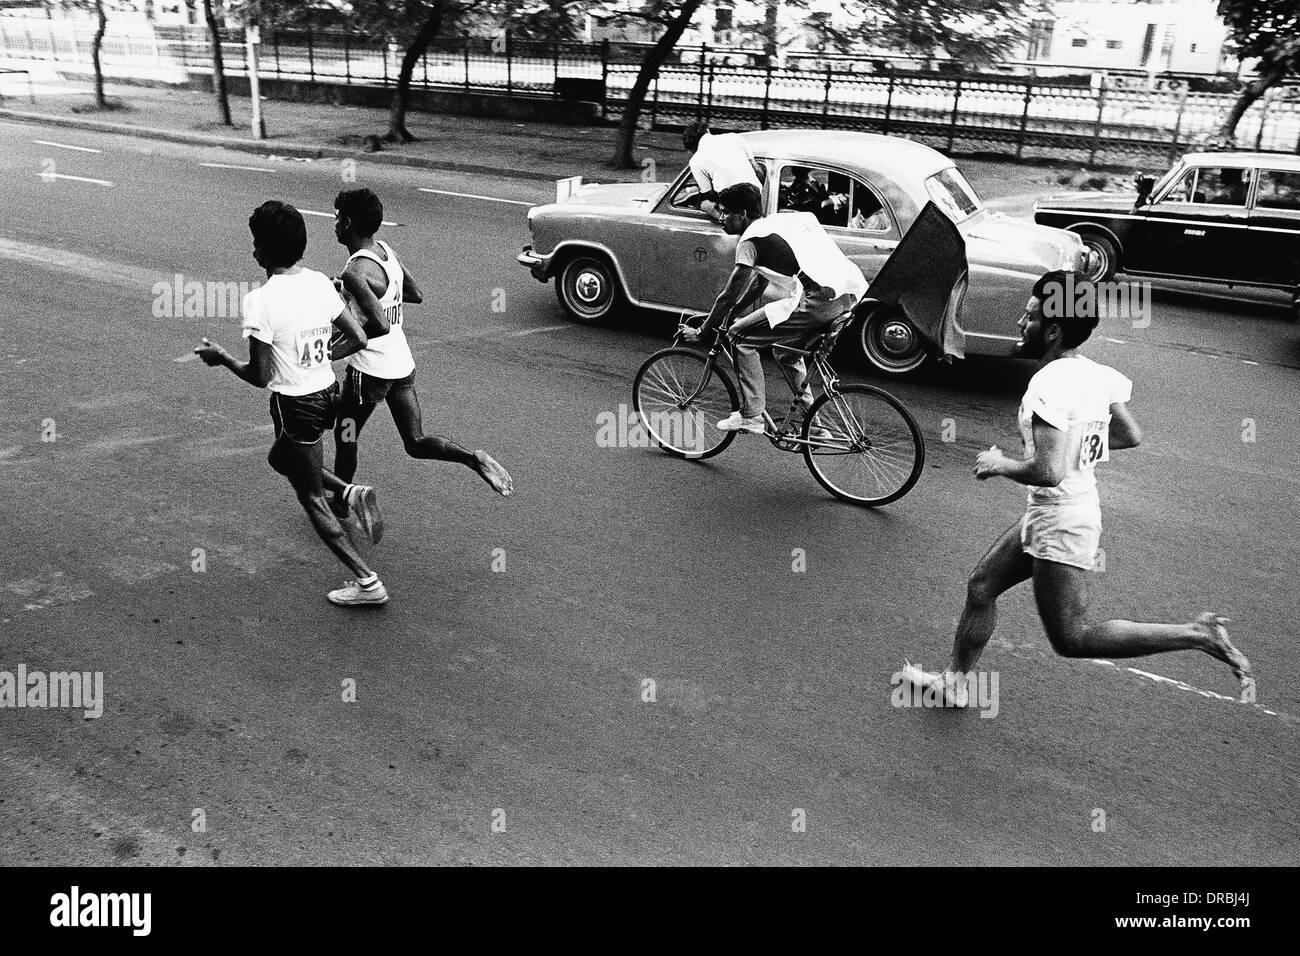 Les coureurs de marathon, Mumbai, Maharashtra, Inde, 1984 Photo Stock